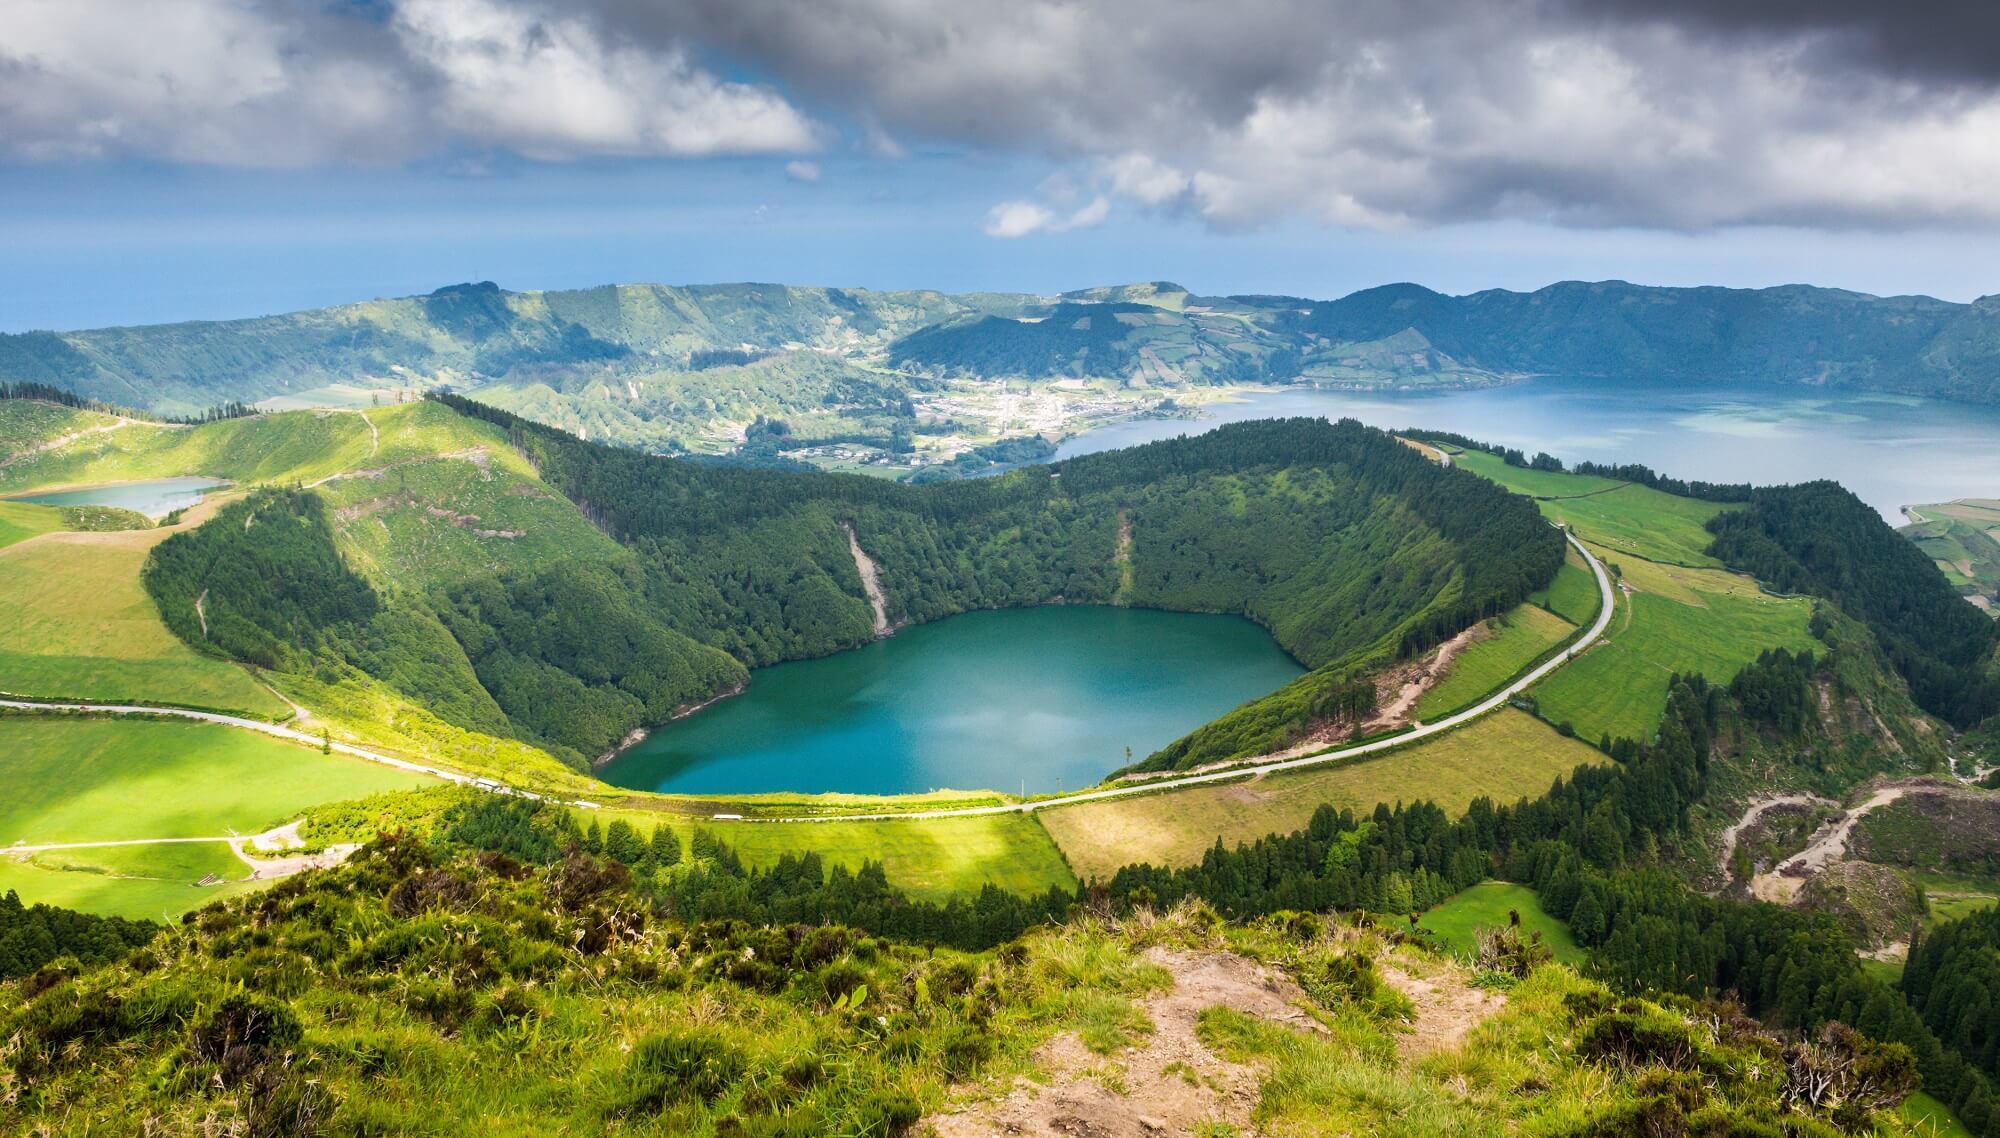 Озеро в кратере вулкана Sete Cidades